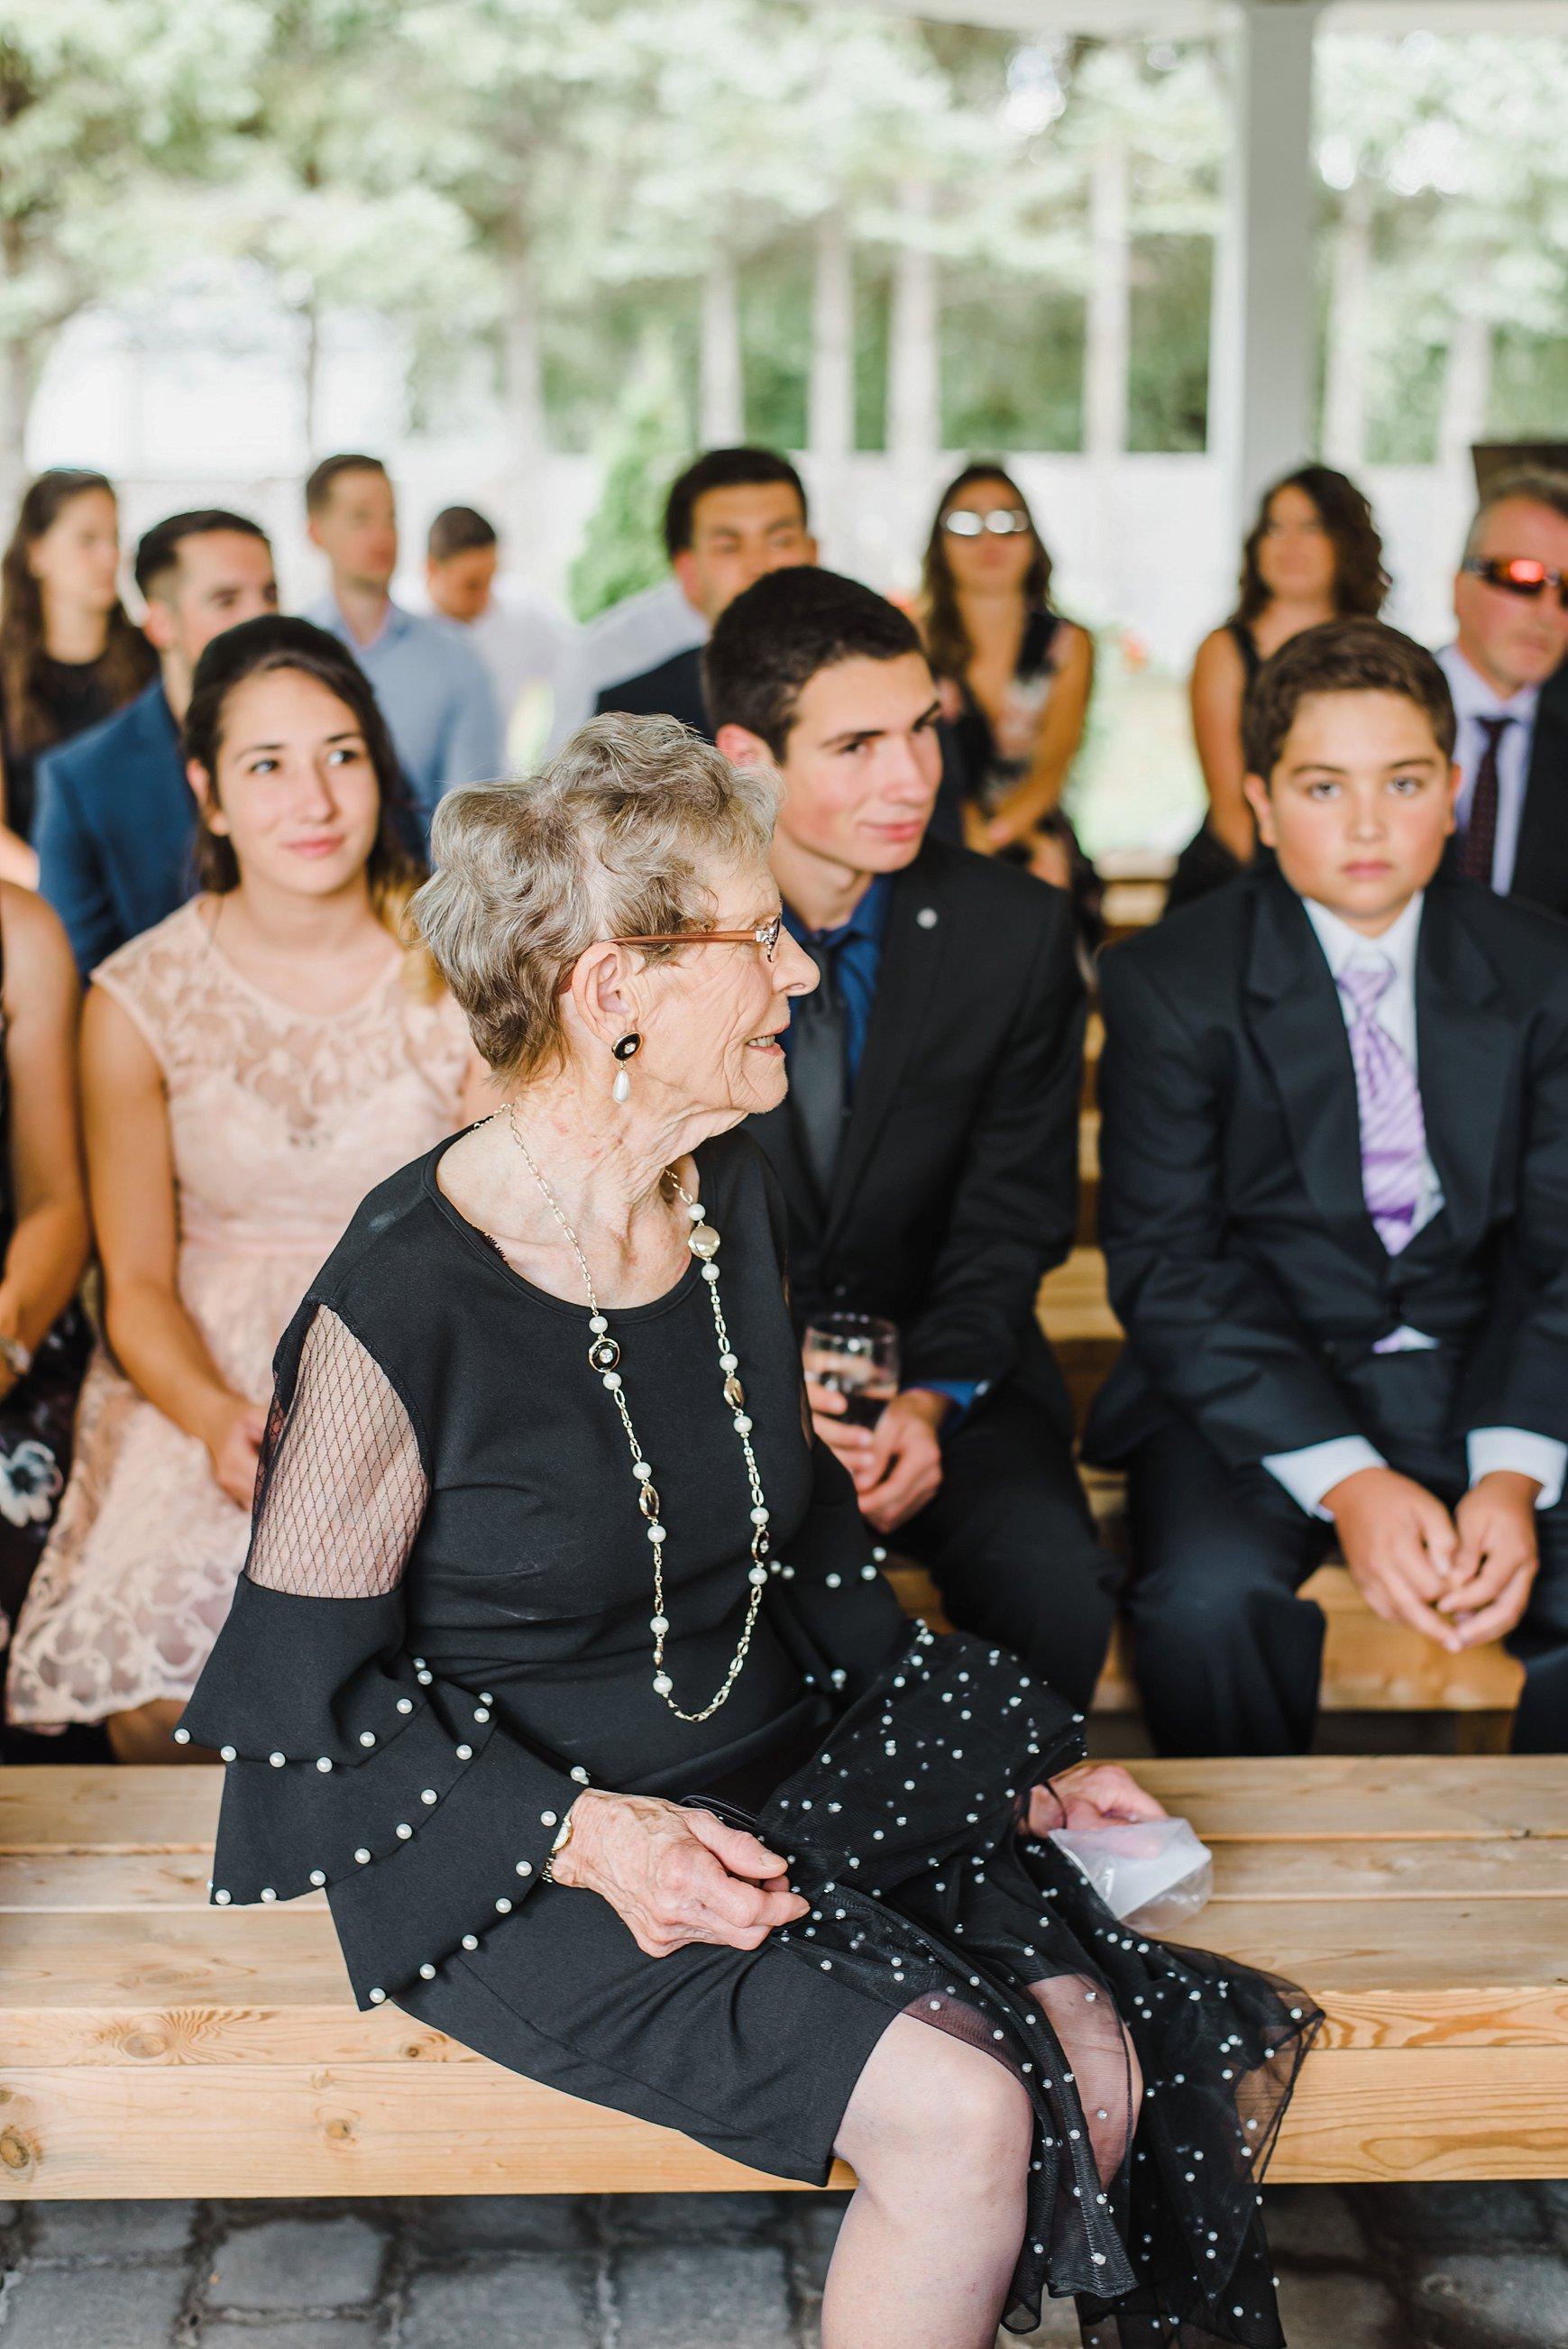 light airy indie fine art ottawa wedding photographer | Ali and Batoul Photography_1263.jpg